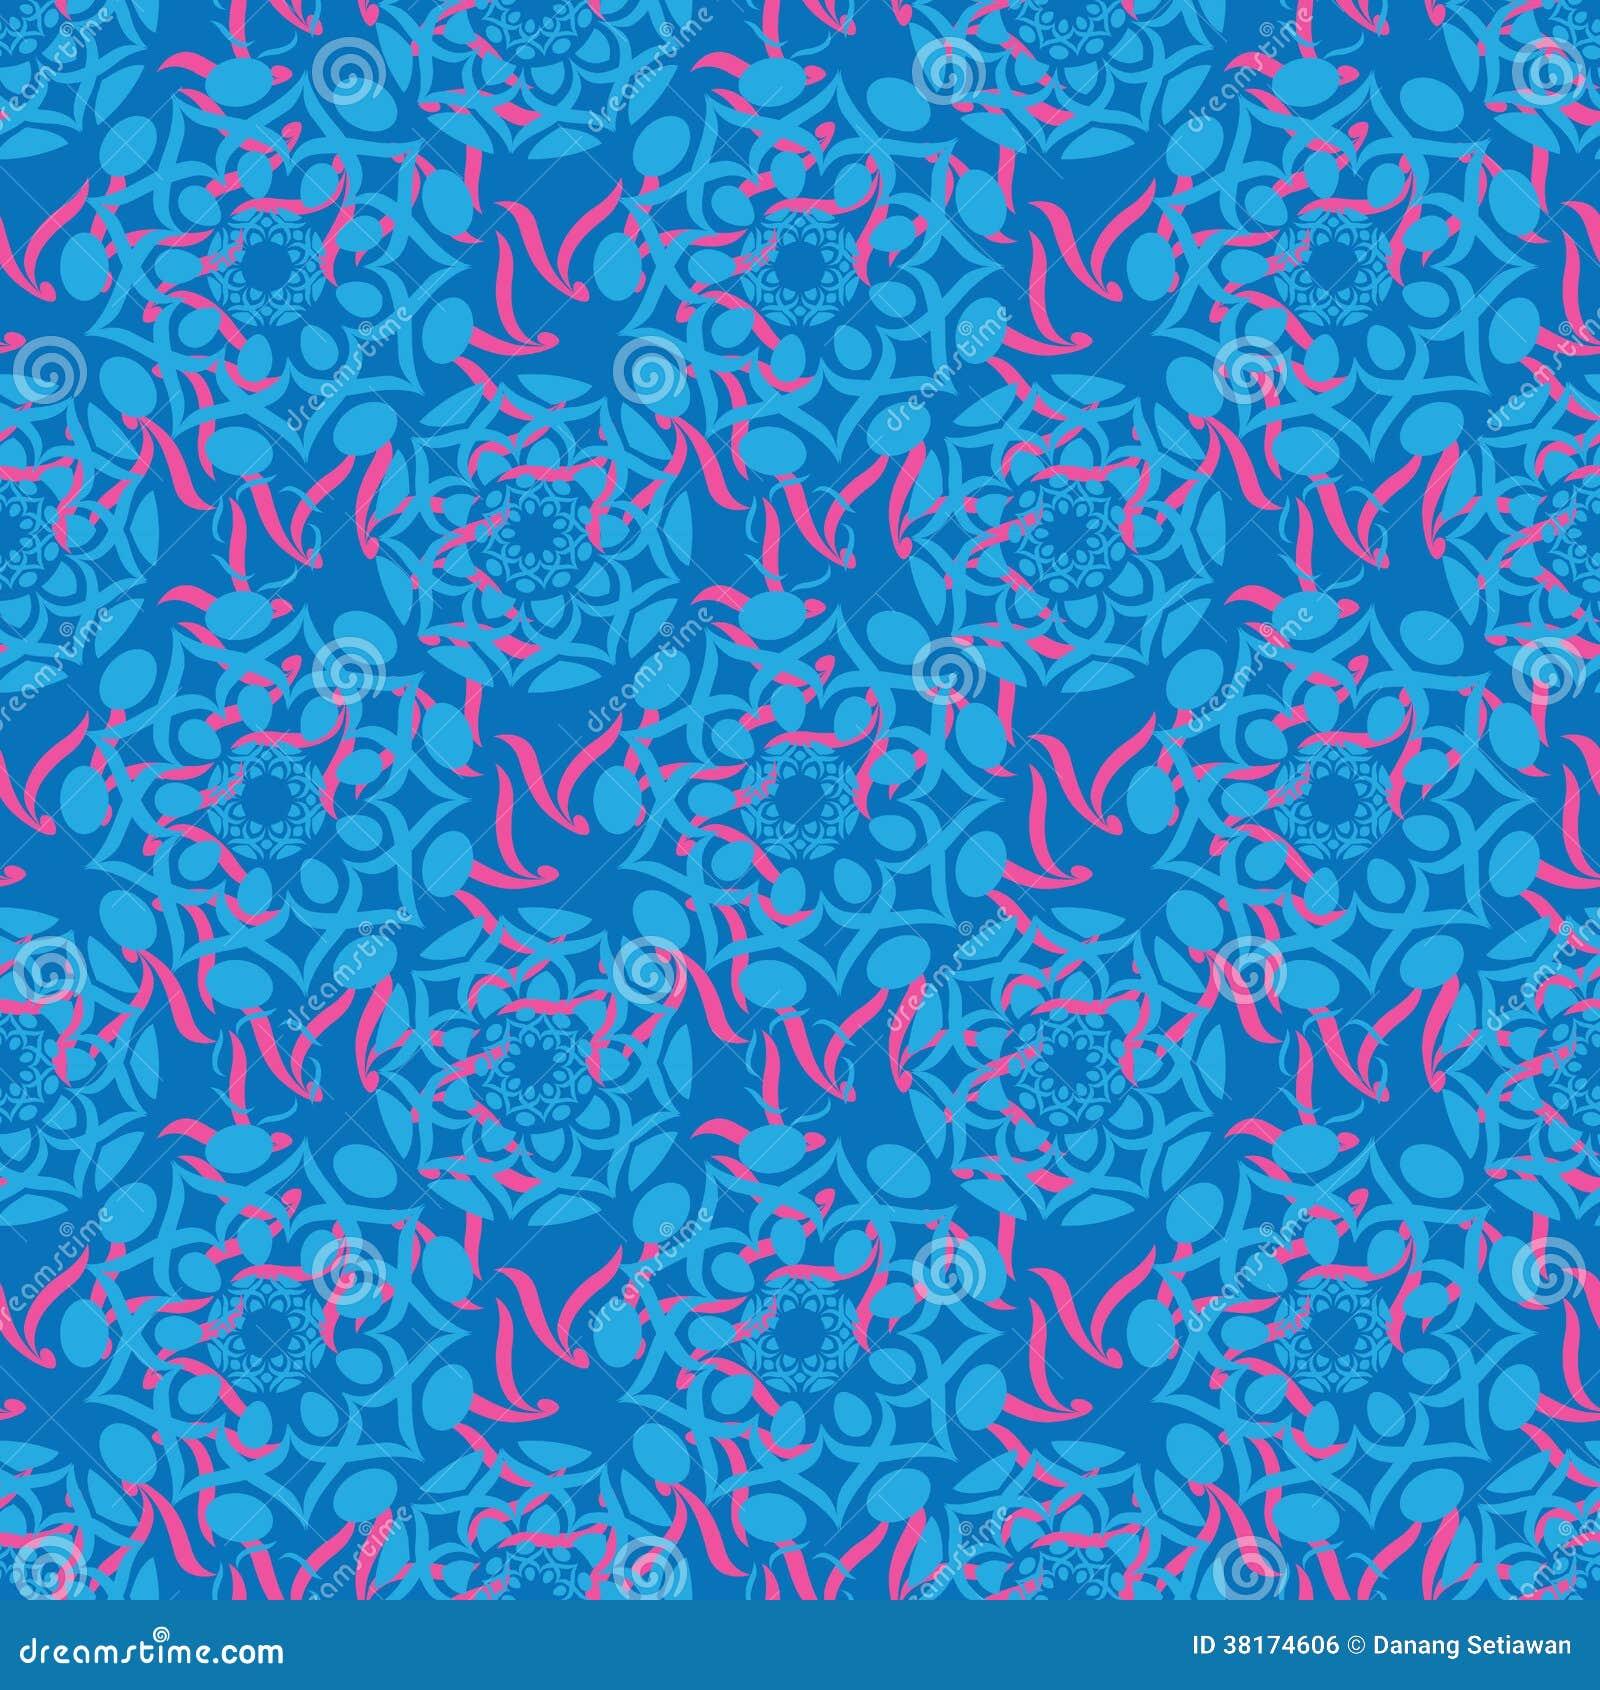 Blue Batik Ornament Stock Vector. Illustration Of Pattern